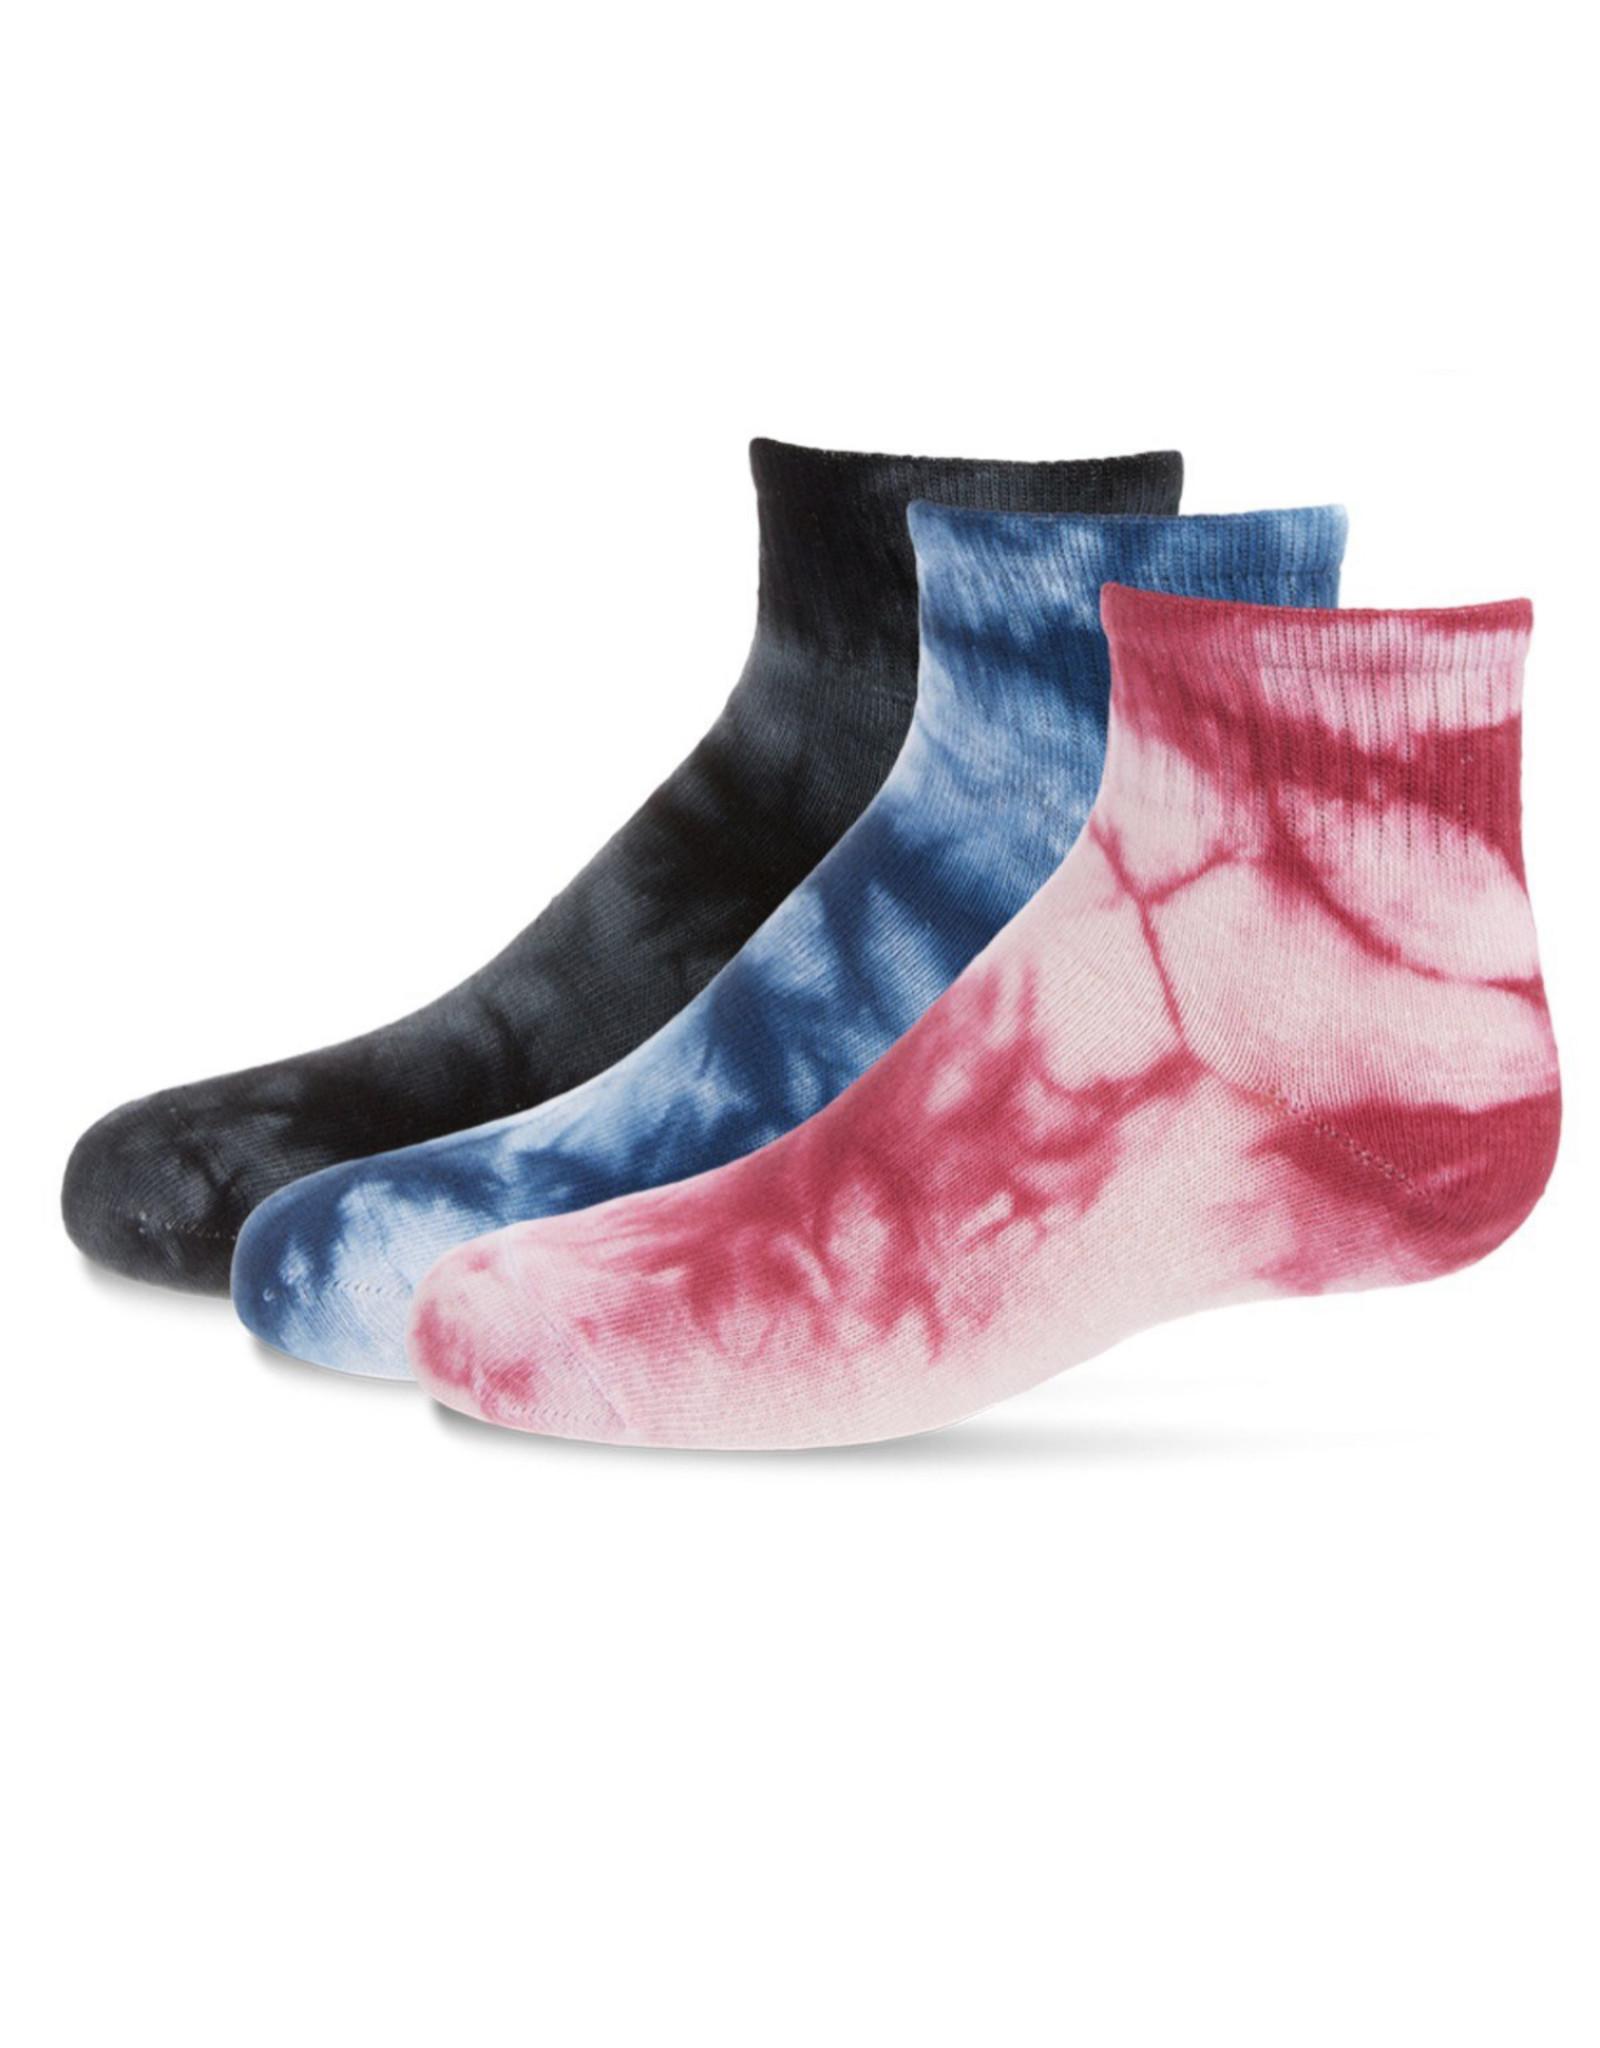 Memoi Memoi Tie Dye Mid Cut Socks 3-Pack MKF-563